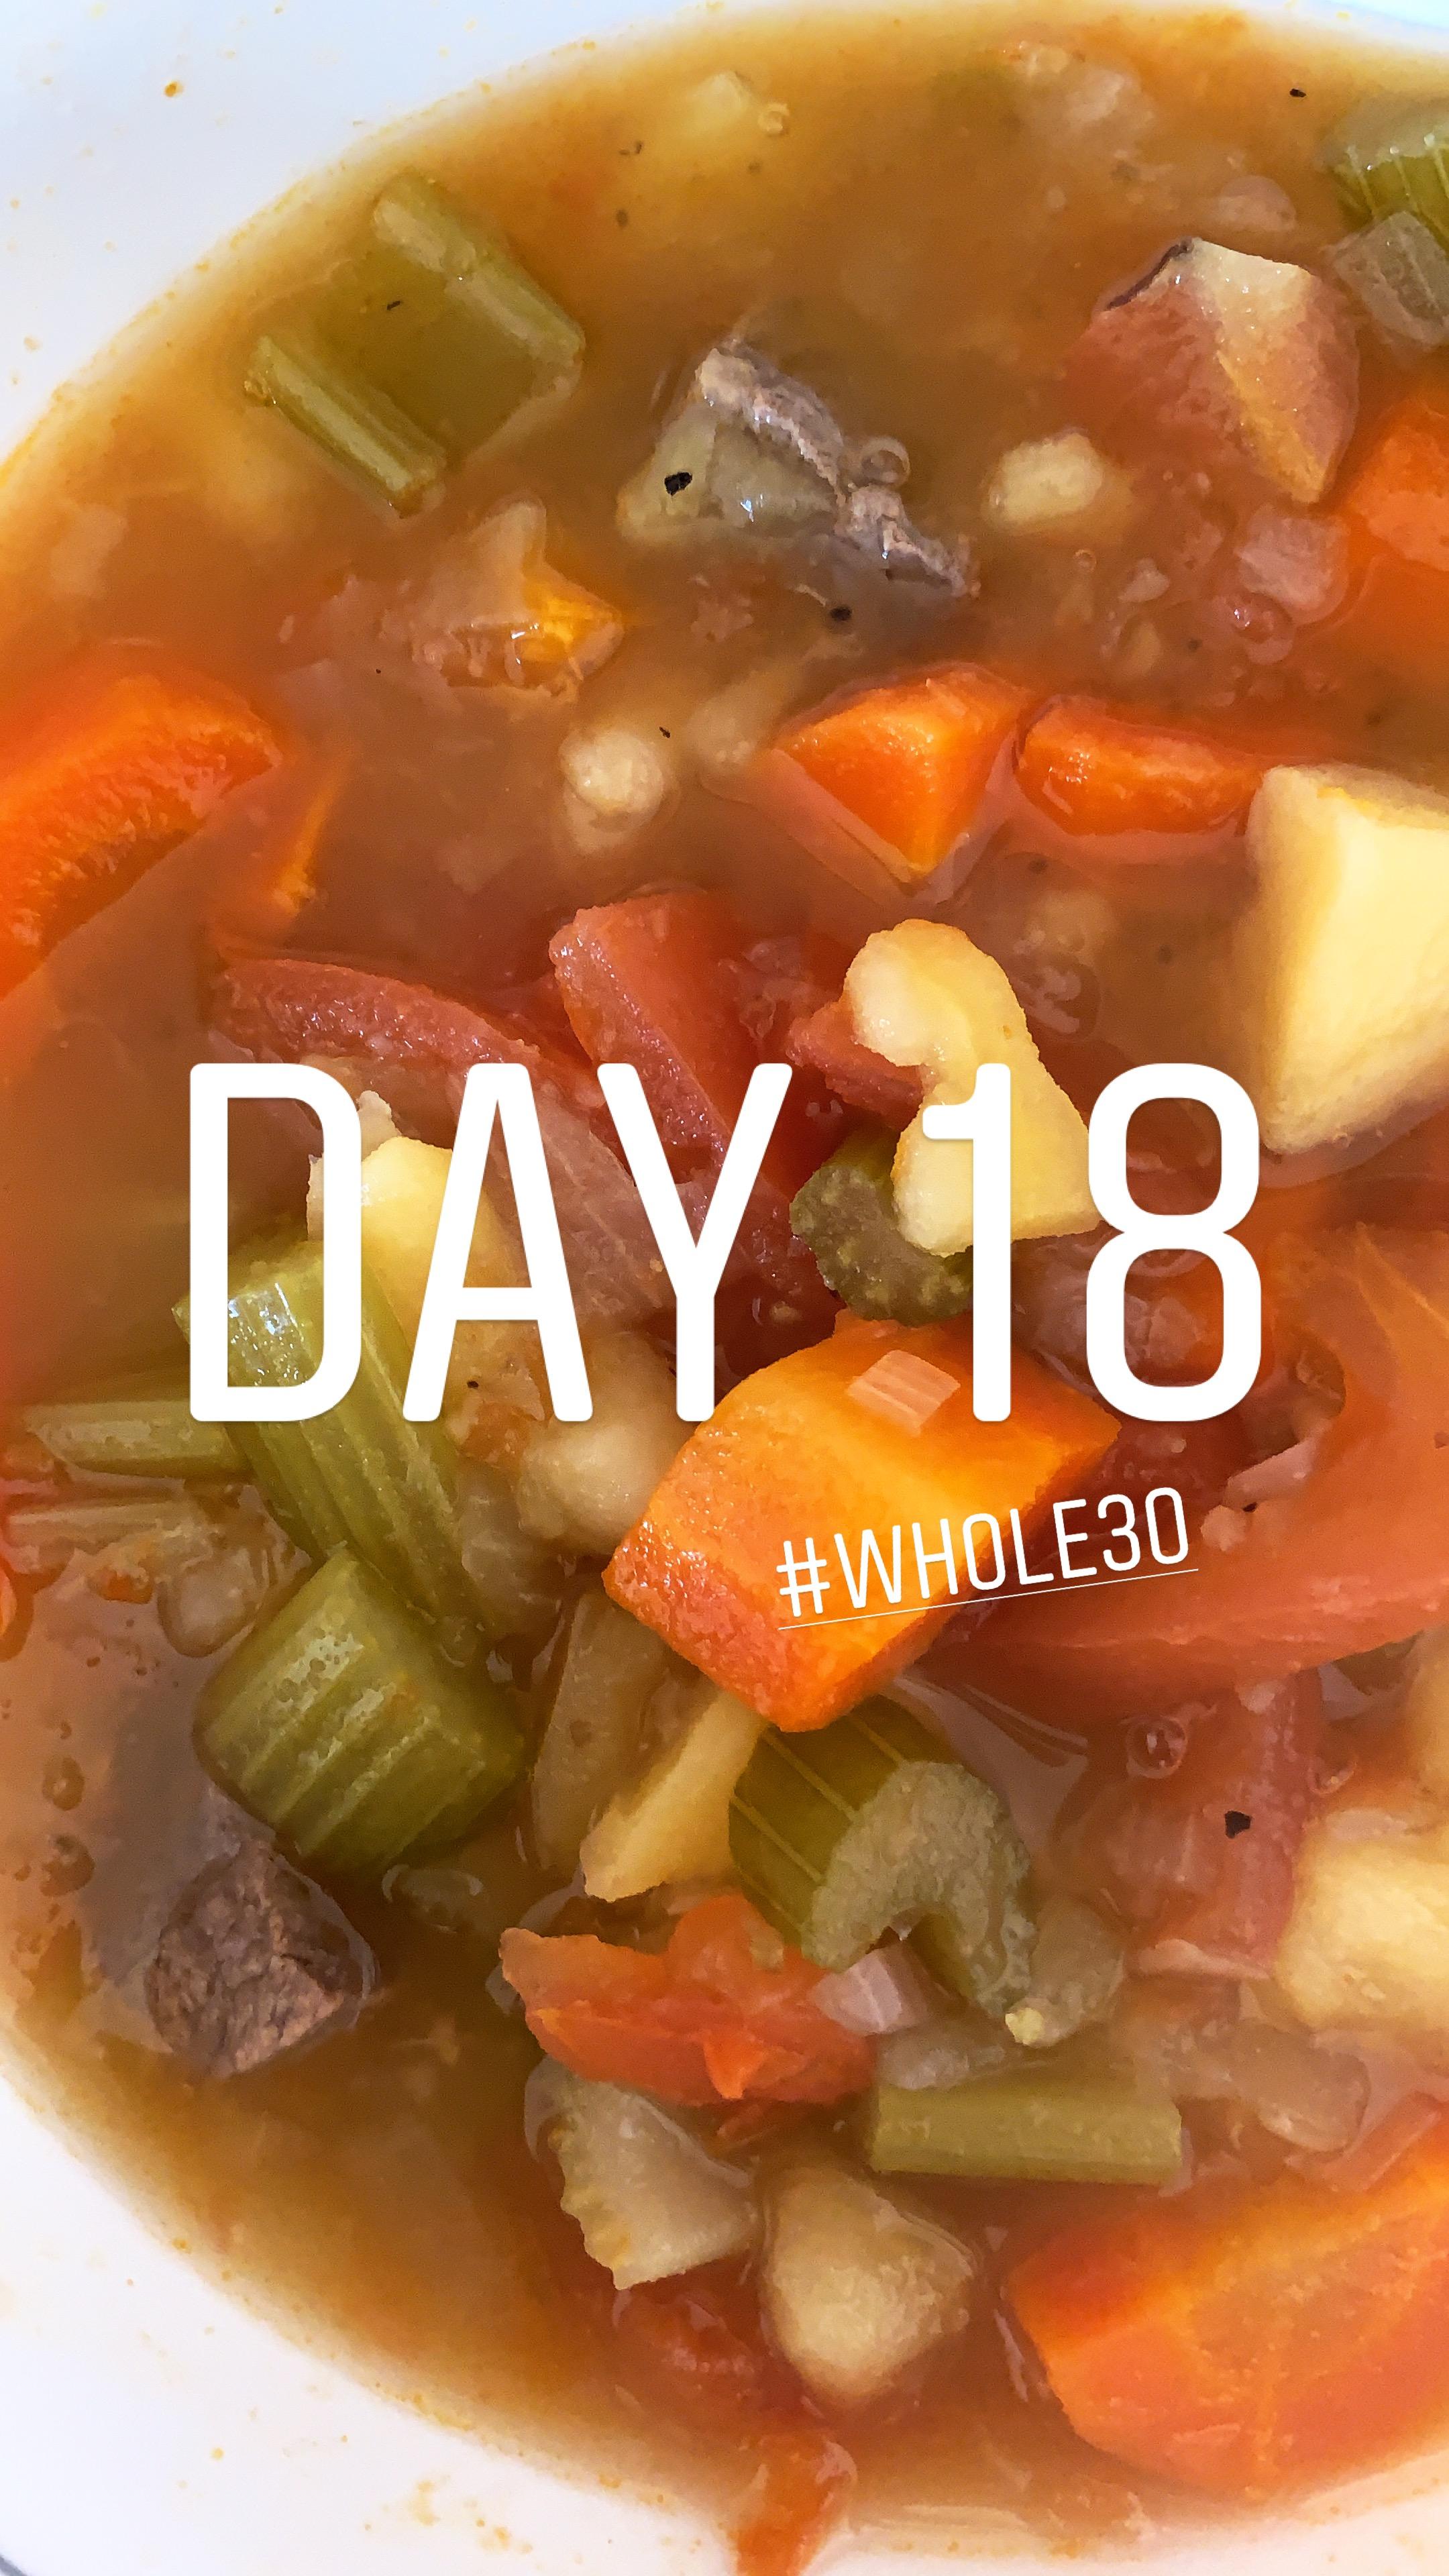 whole30 challenge cynthia chung food lifestyle change0036.JPG